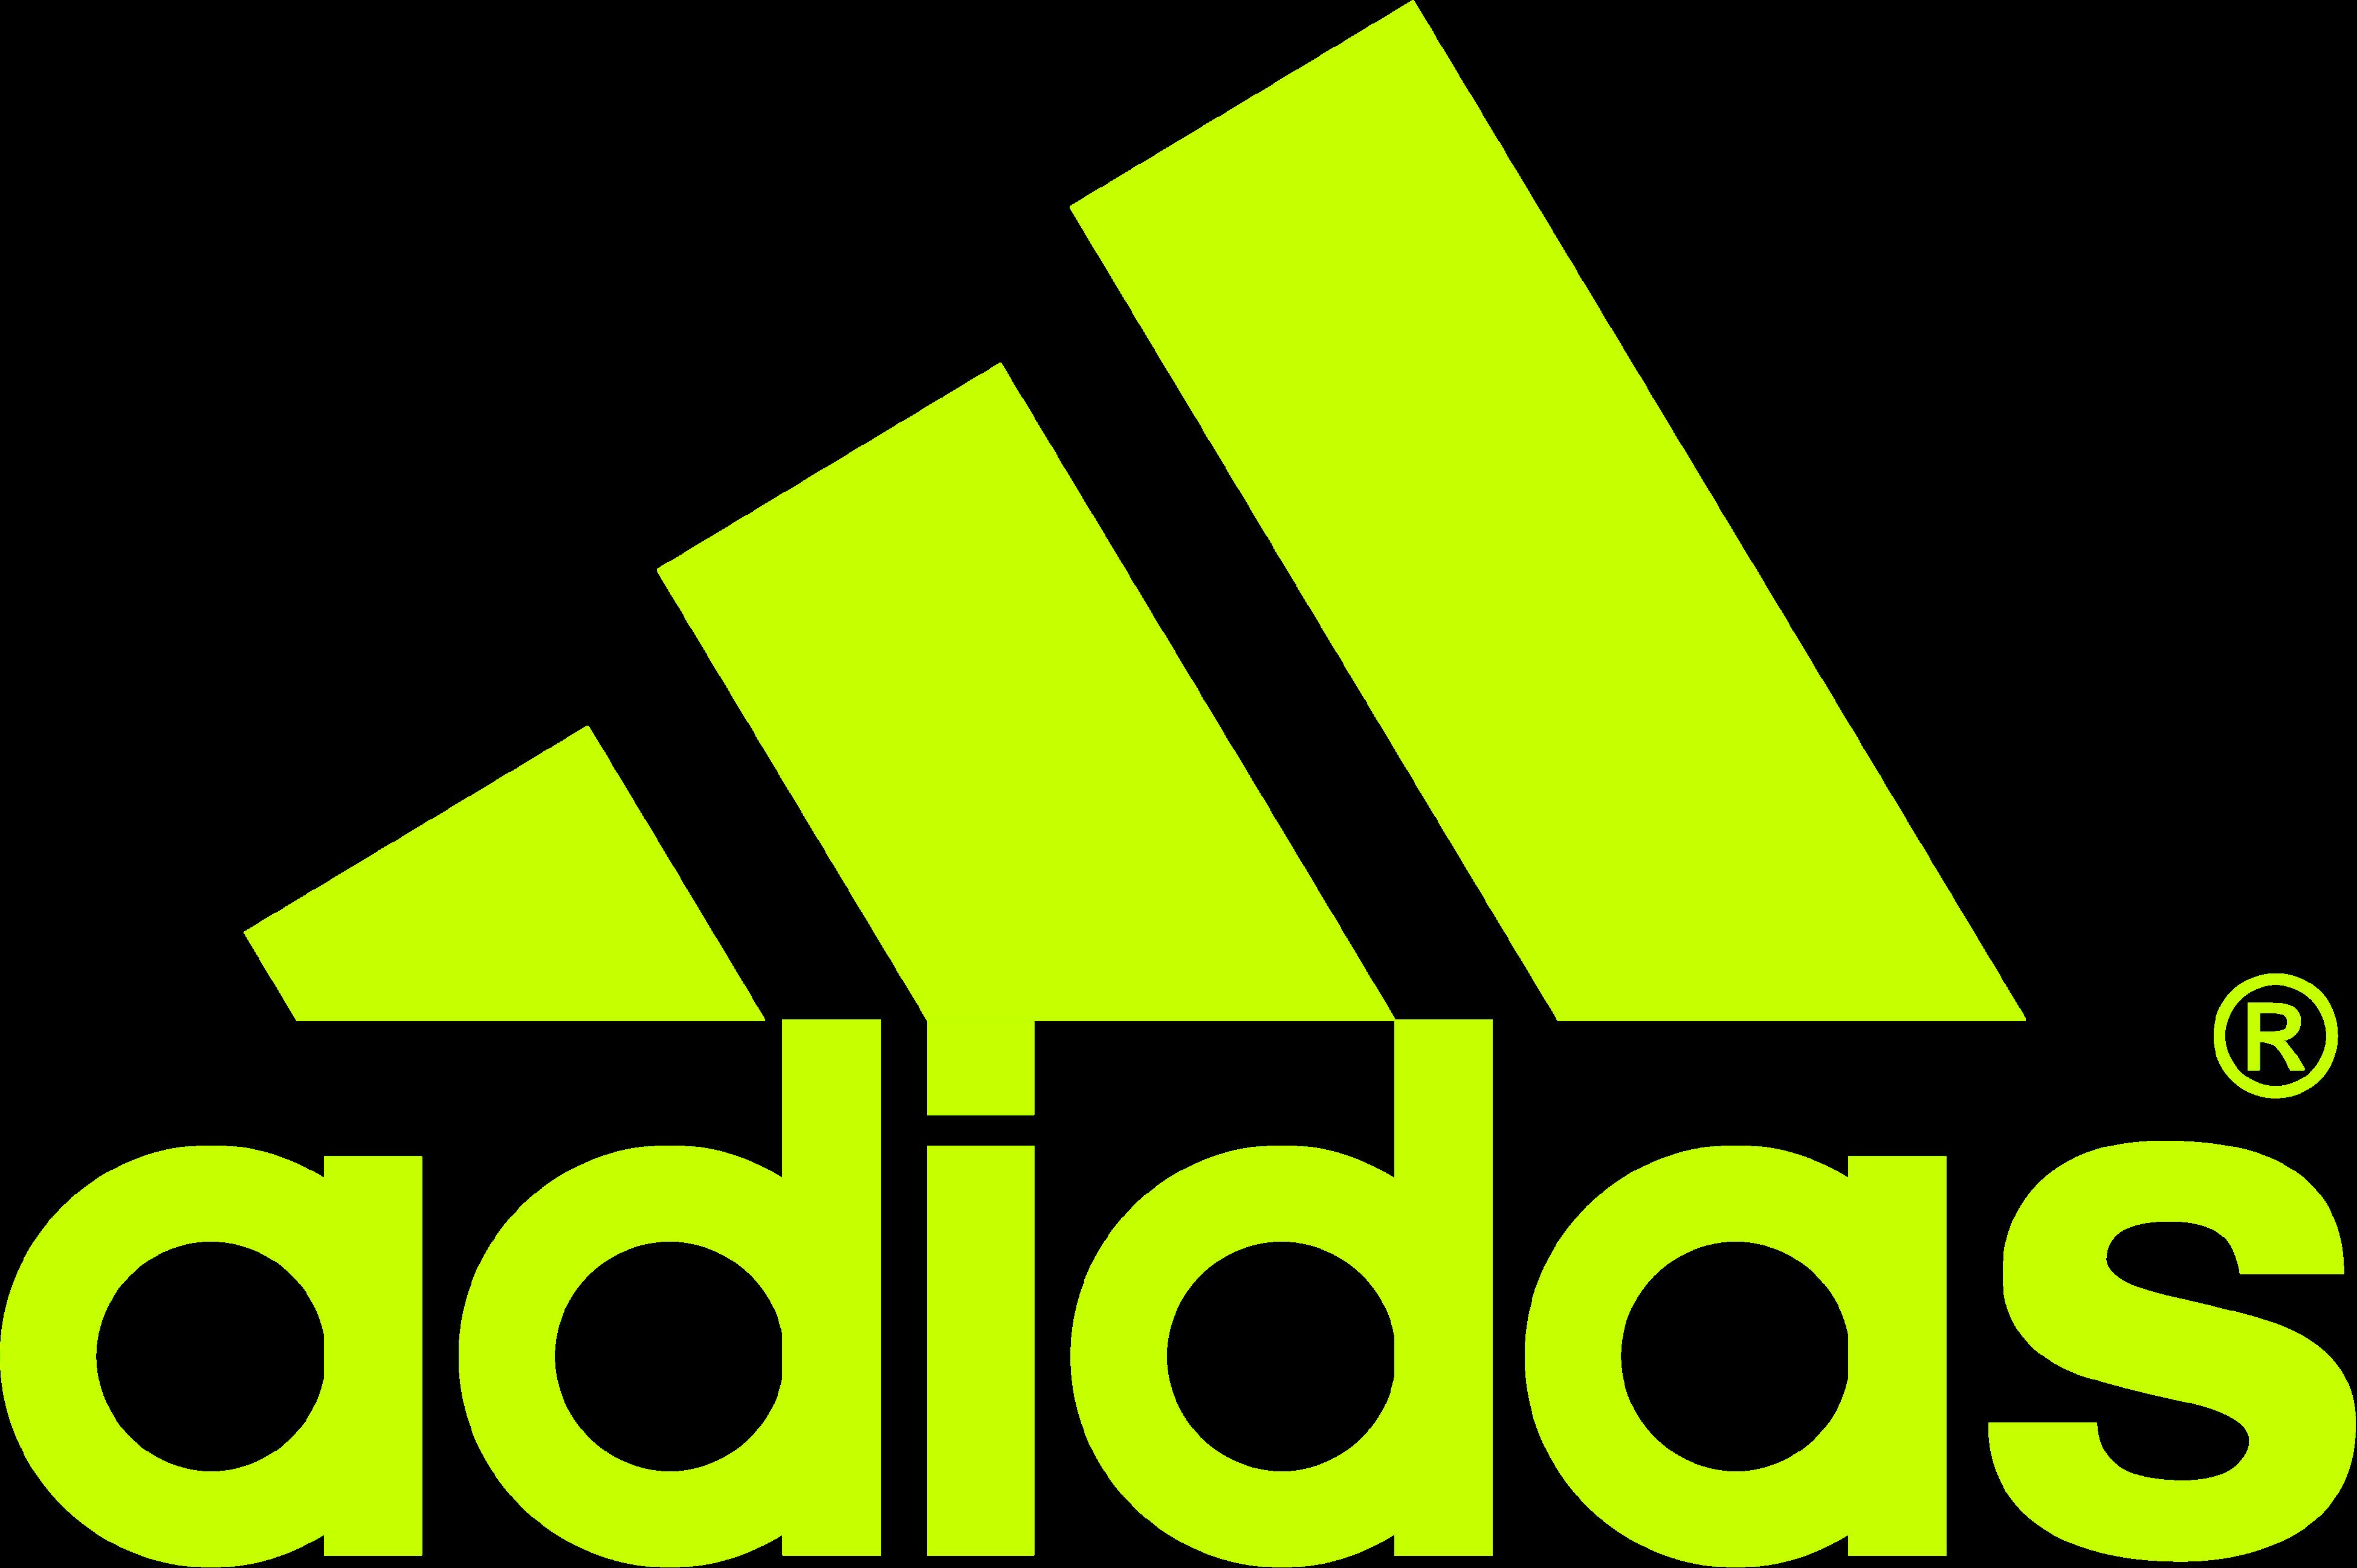 Adidas logo PNG | Adidas brand, Adidas logo, Adidas wallpapers - Japanese Nike Logo